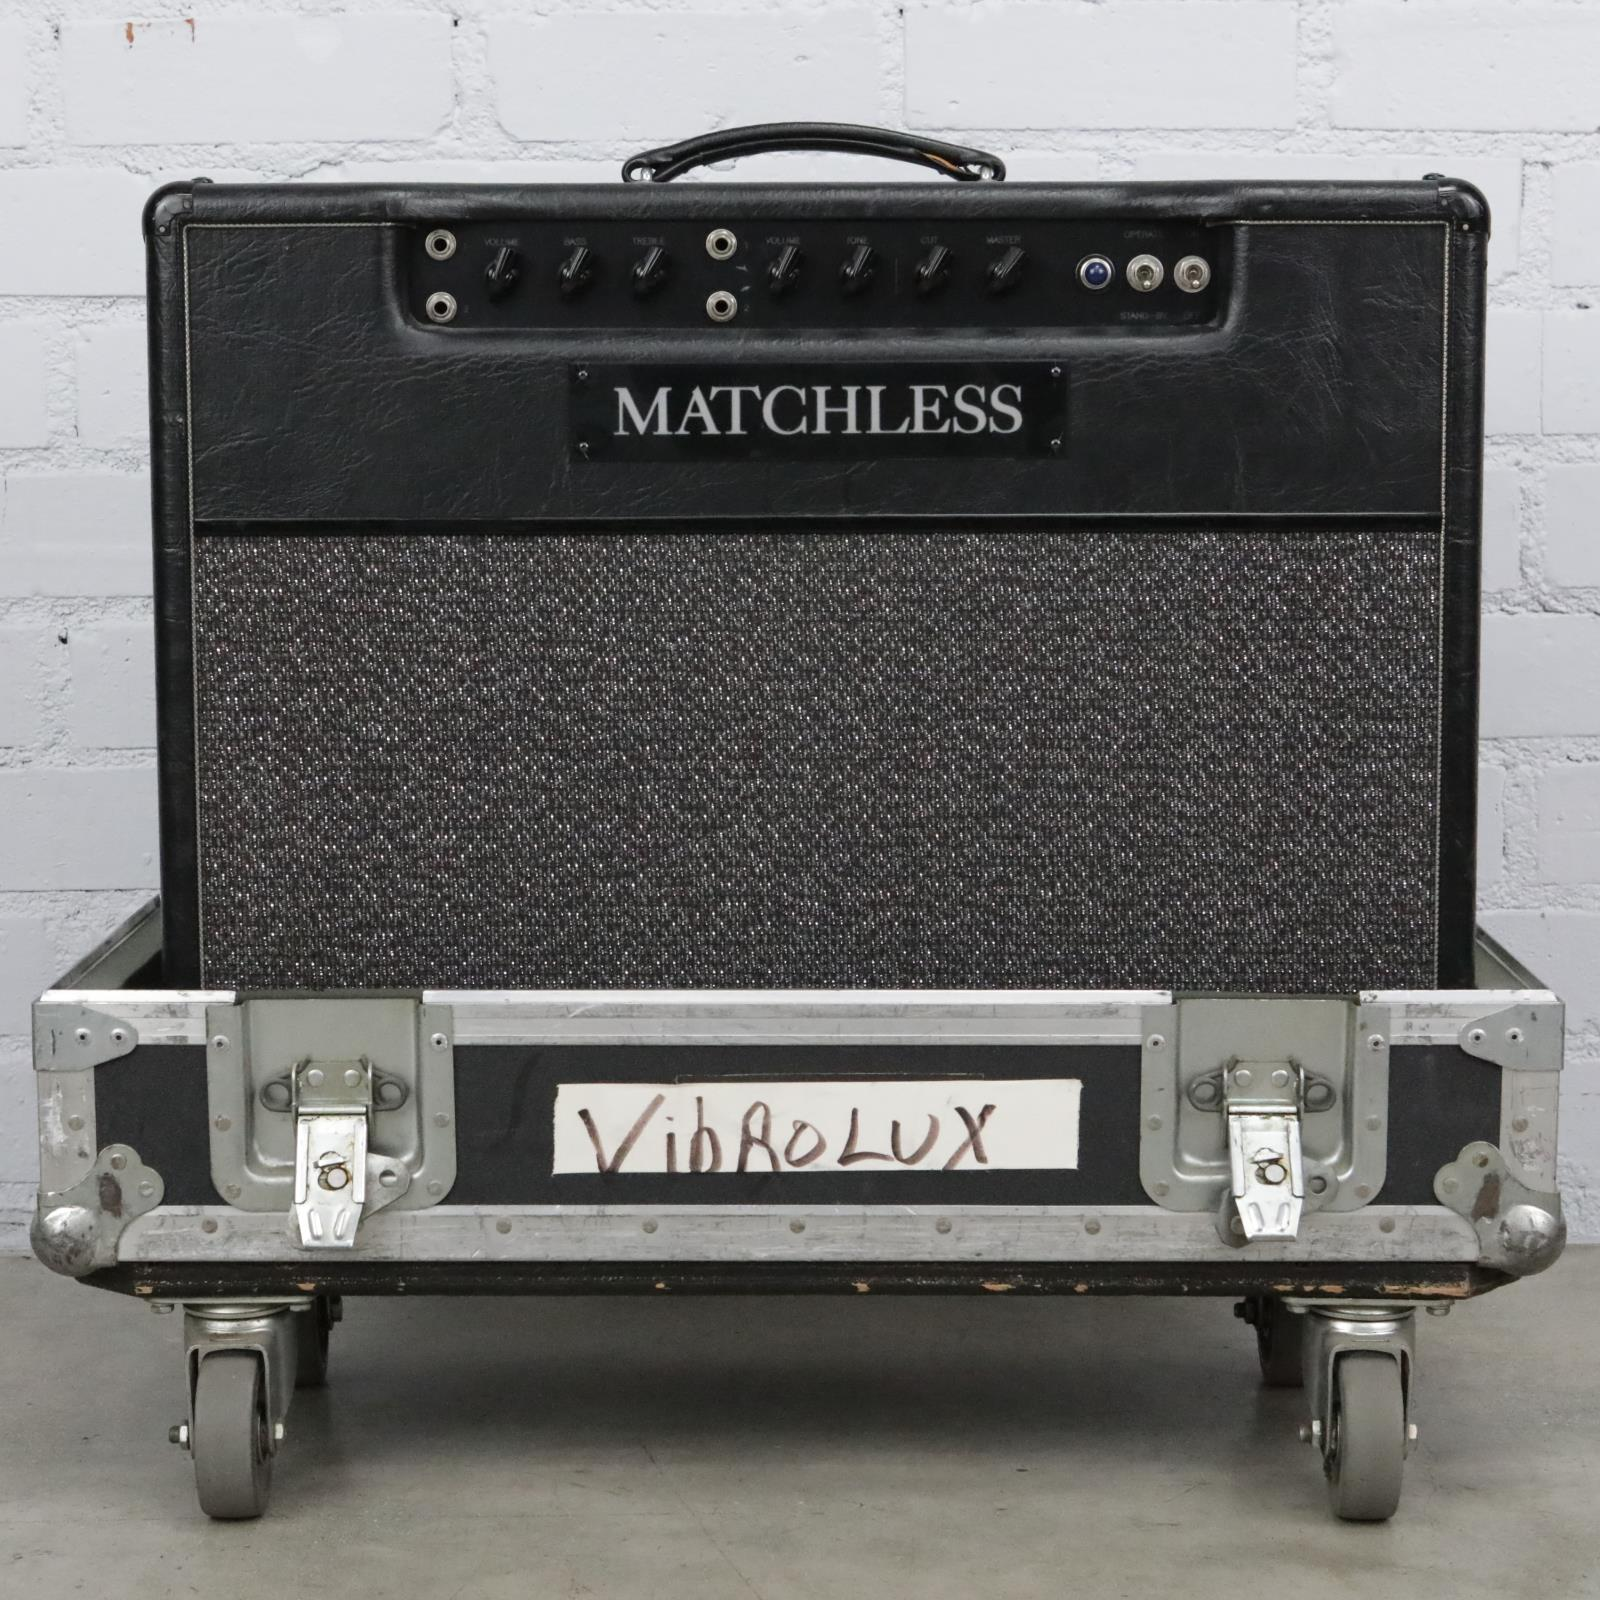 1994 Matchless D/C-30L Guitar Tube Amplifier w/ Case DC-30 T Bone Burnett #41412